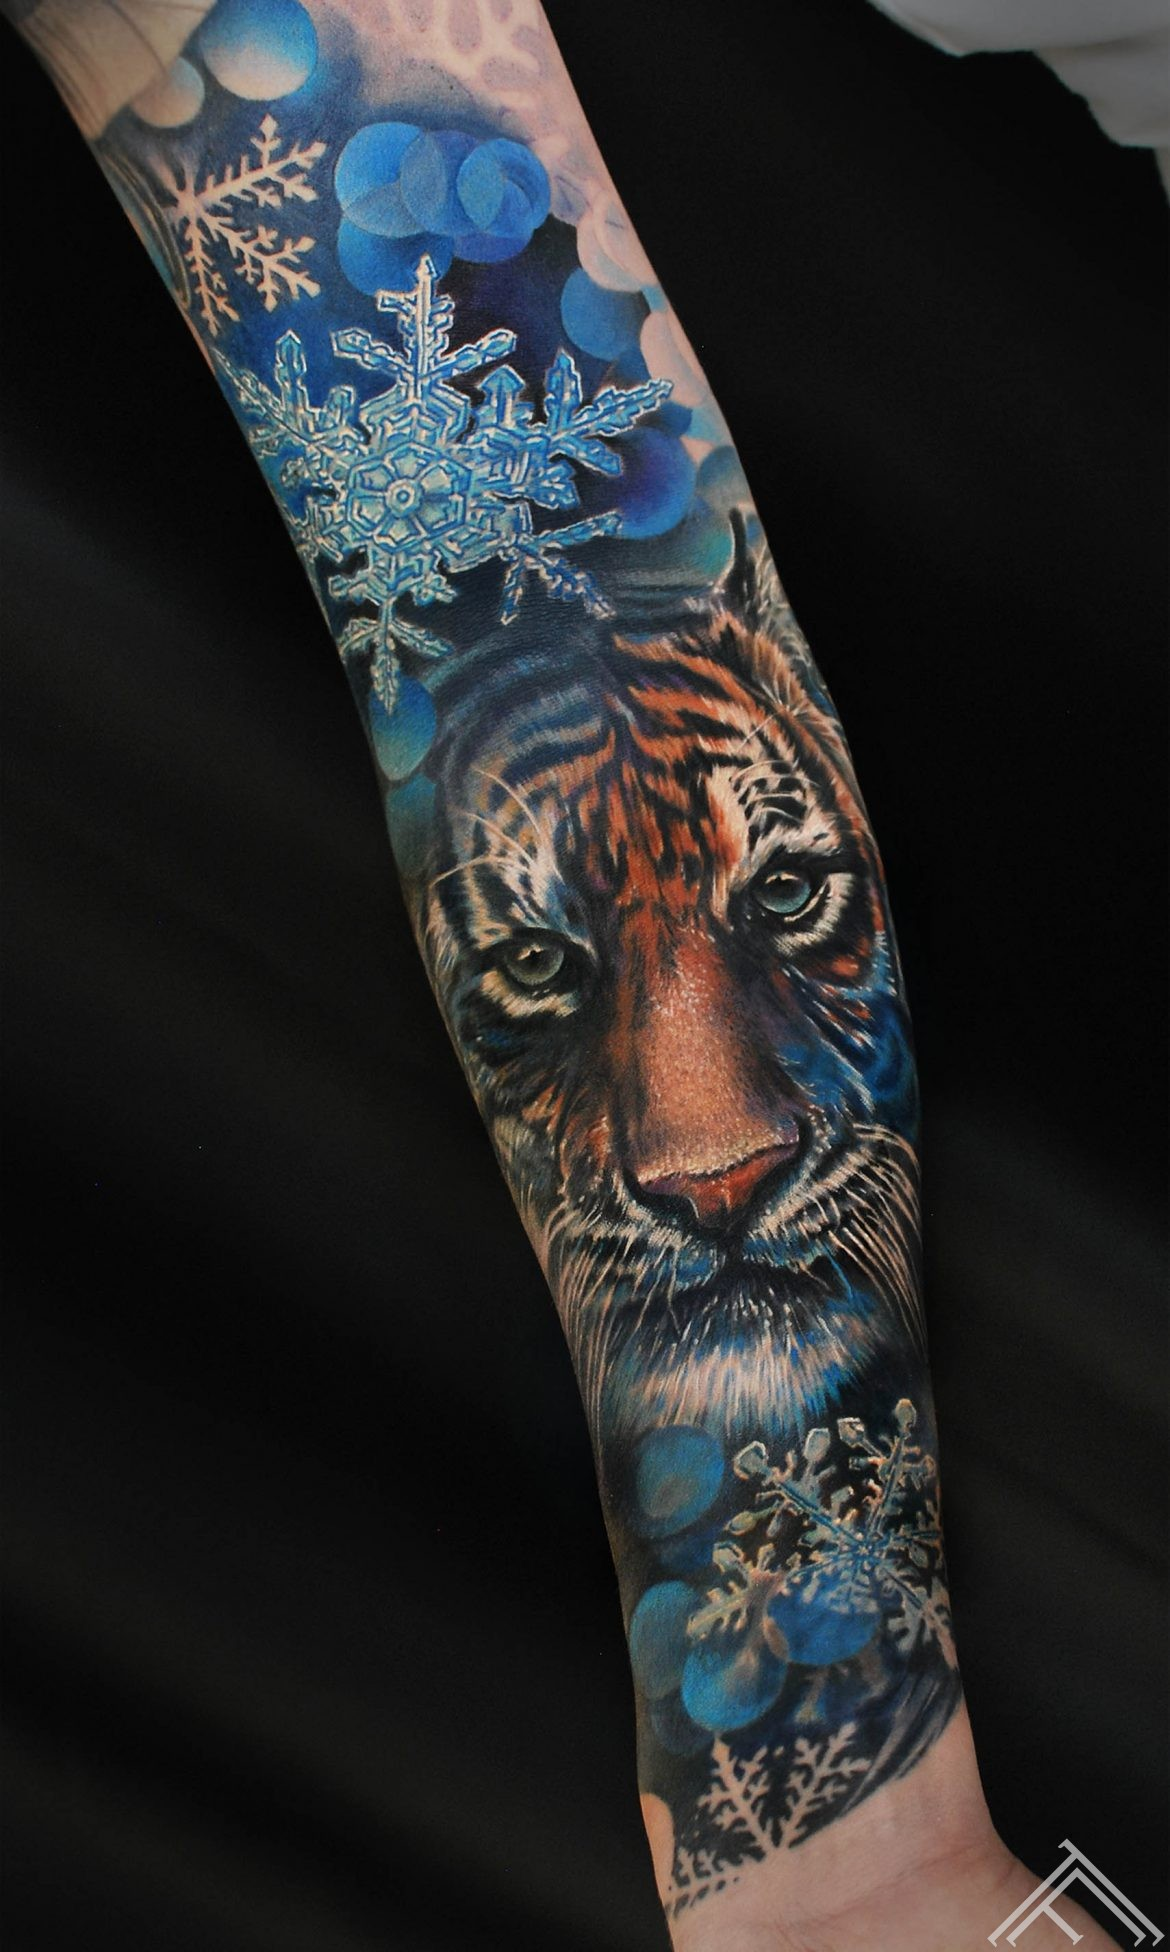 tiger-snowflake-snow-winter-cat-animal-tattoo-tattoofrequency-riga-marispavlo-tetovejums-tigeris-FB